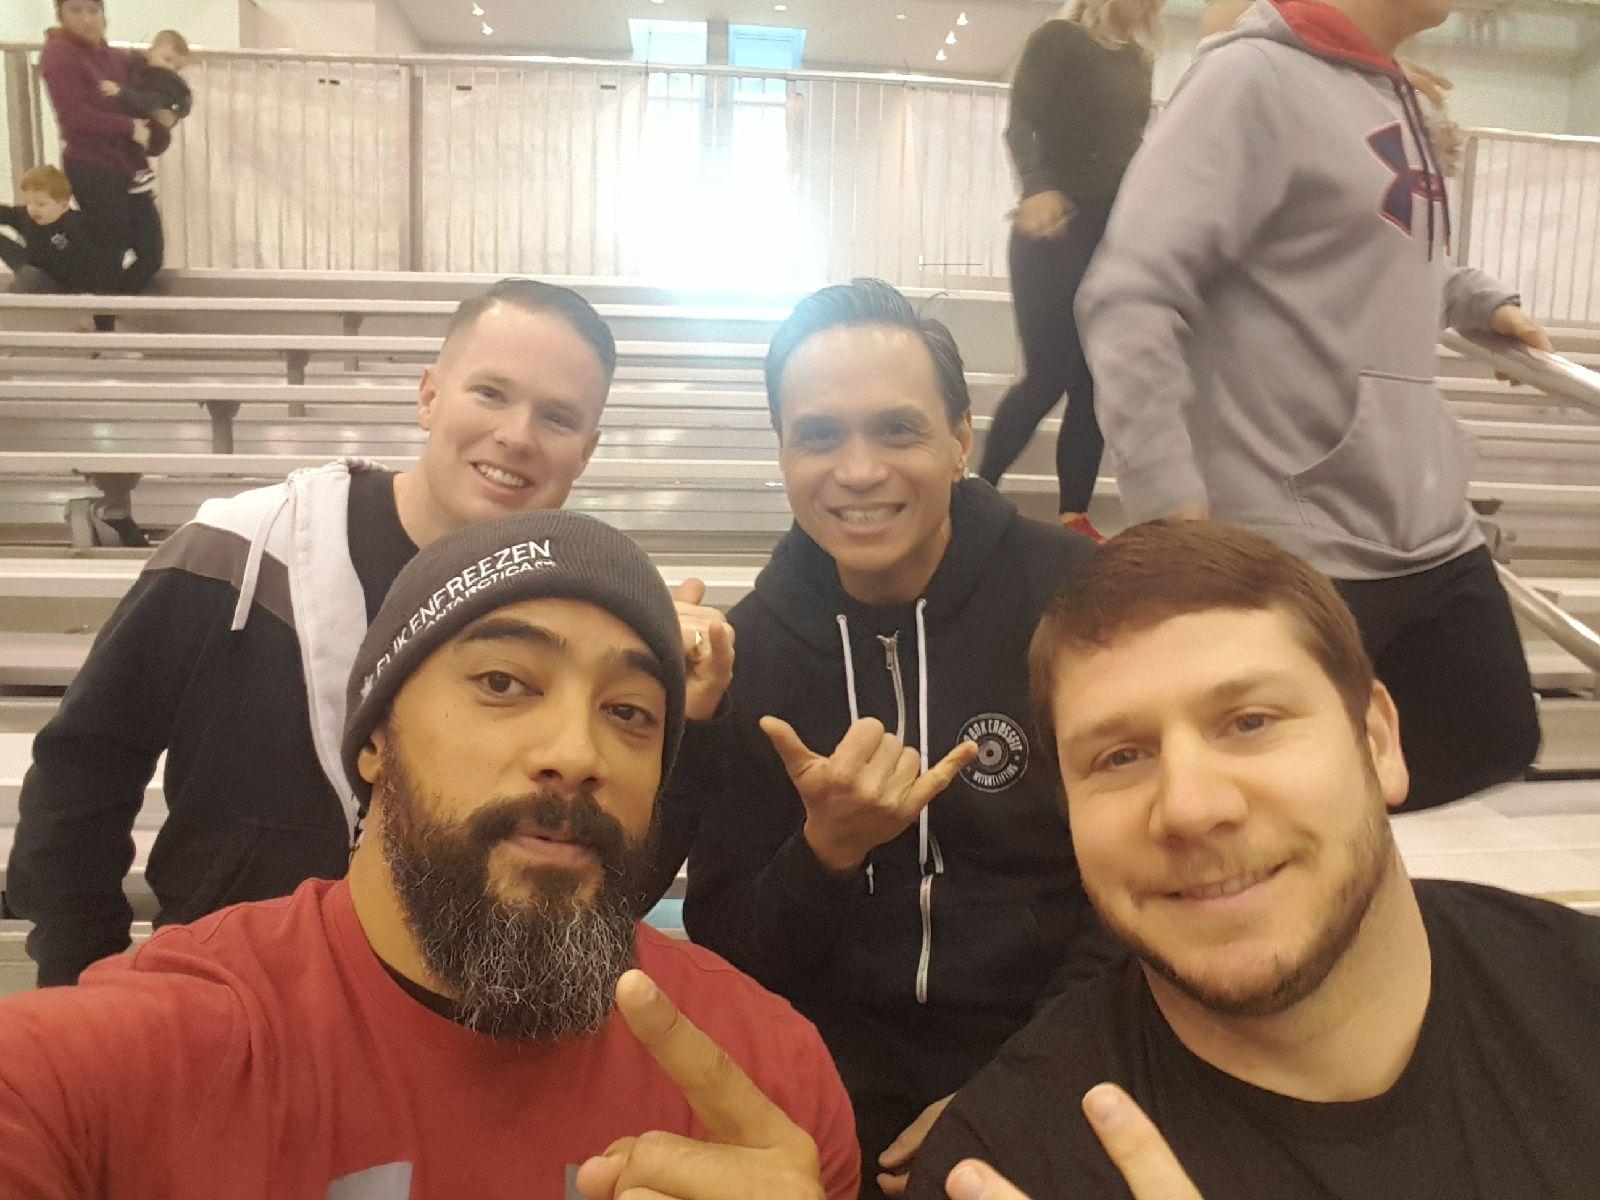 Team Grit '19: 2 Vicious 2 Delicious- Dave, JC, James, Gil